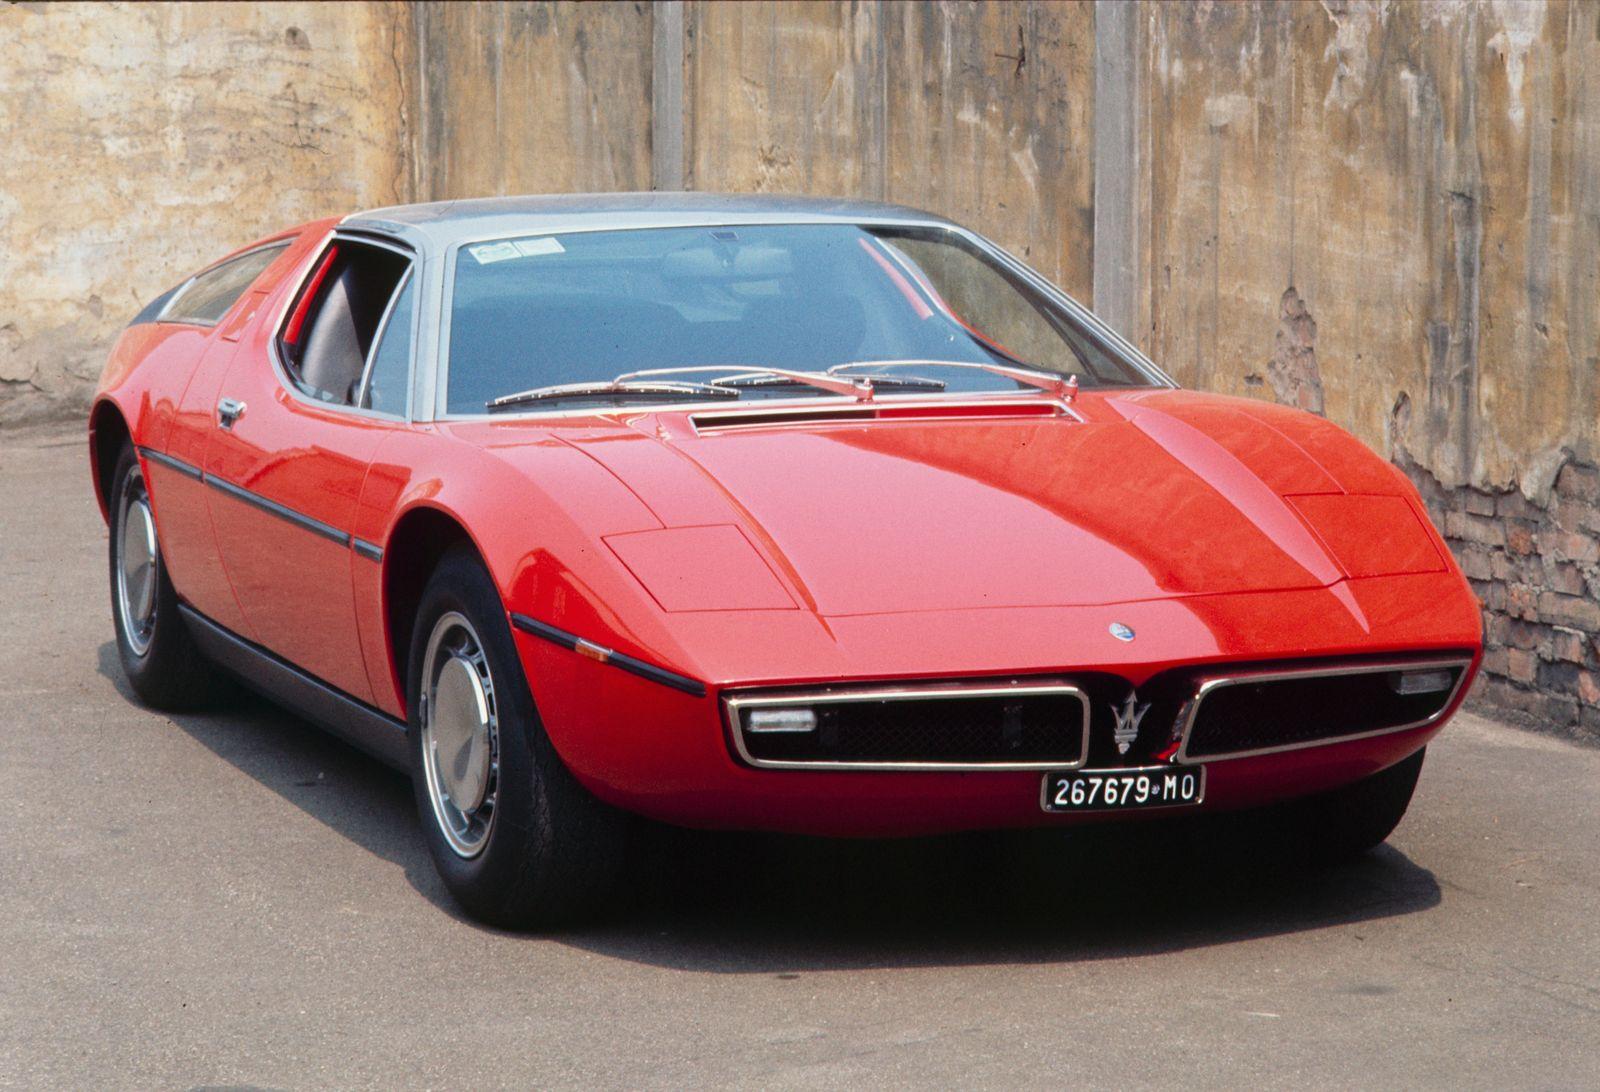 Maserati Bora Factory Tour - Drive